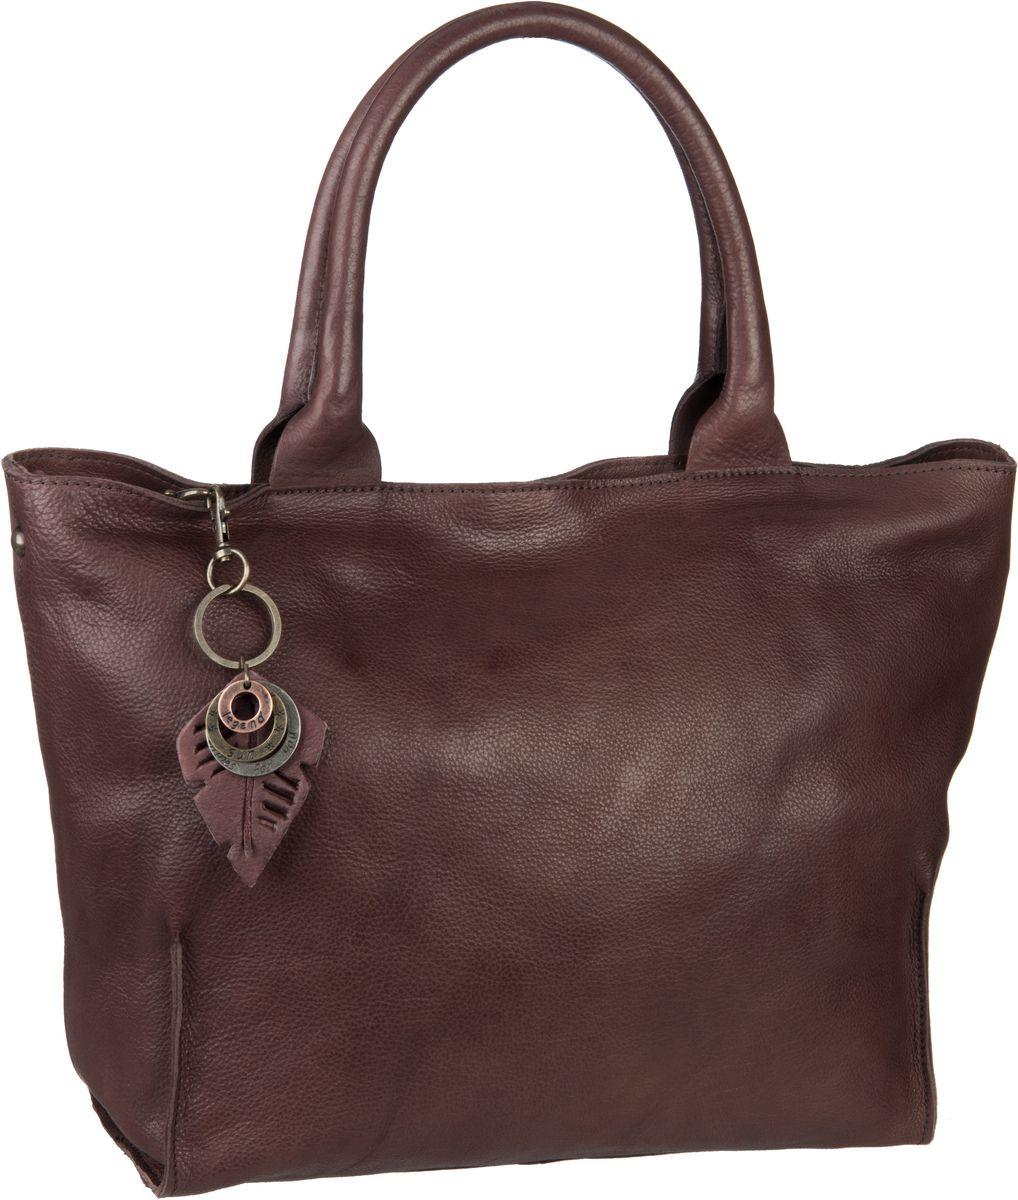 Legend Bardot Brown - Handtasche